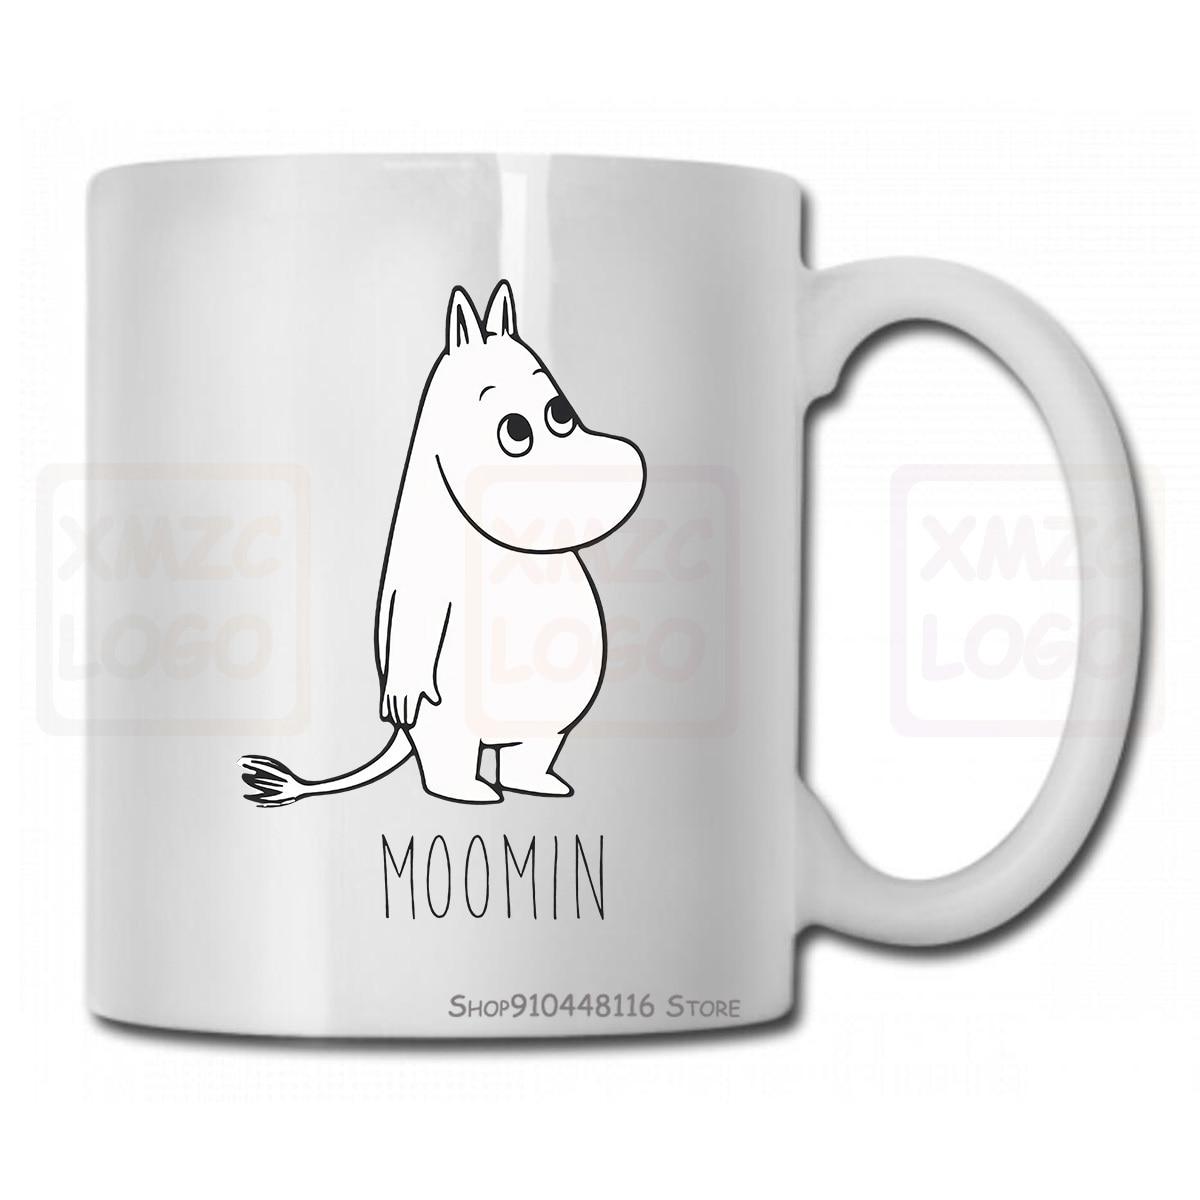 Moomin Troll drôle Tv Bookharajuku Streetwear tasse tasse Menretro cadeau inspiré femmes hommes